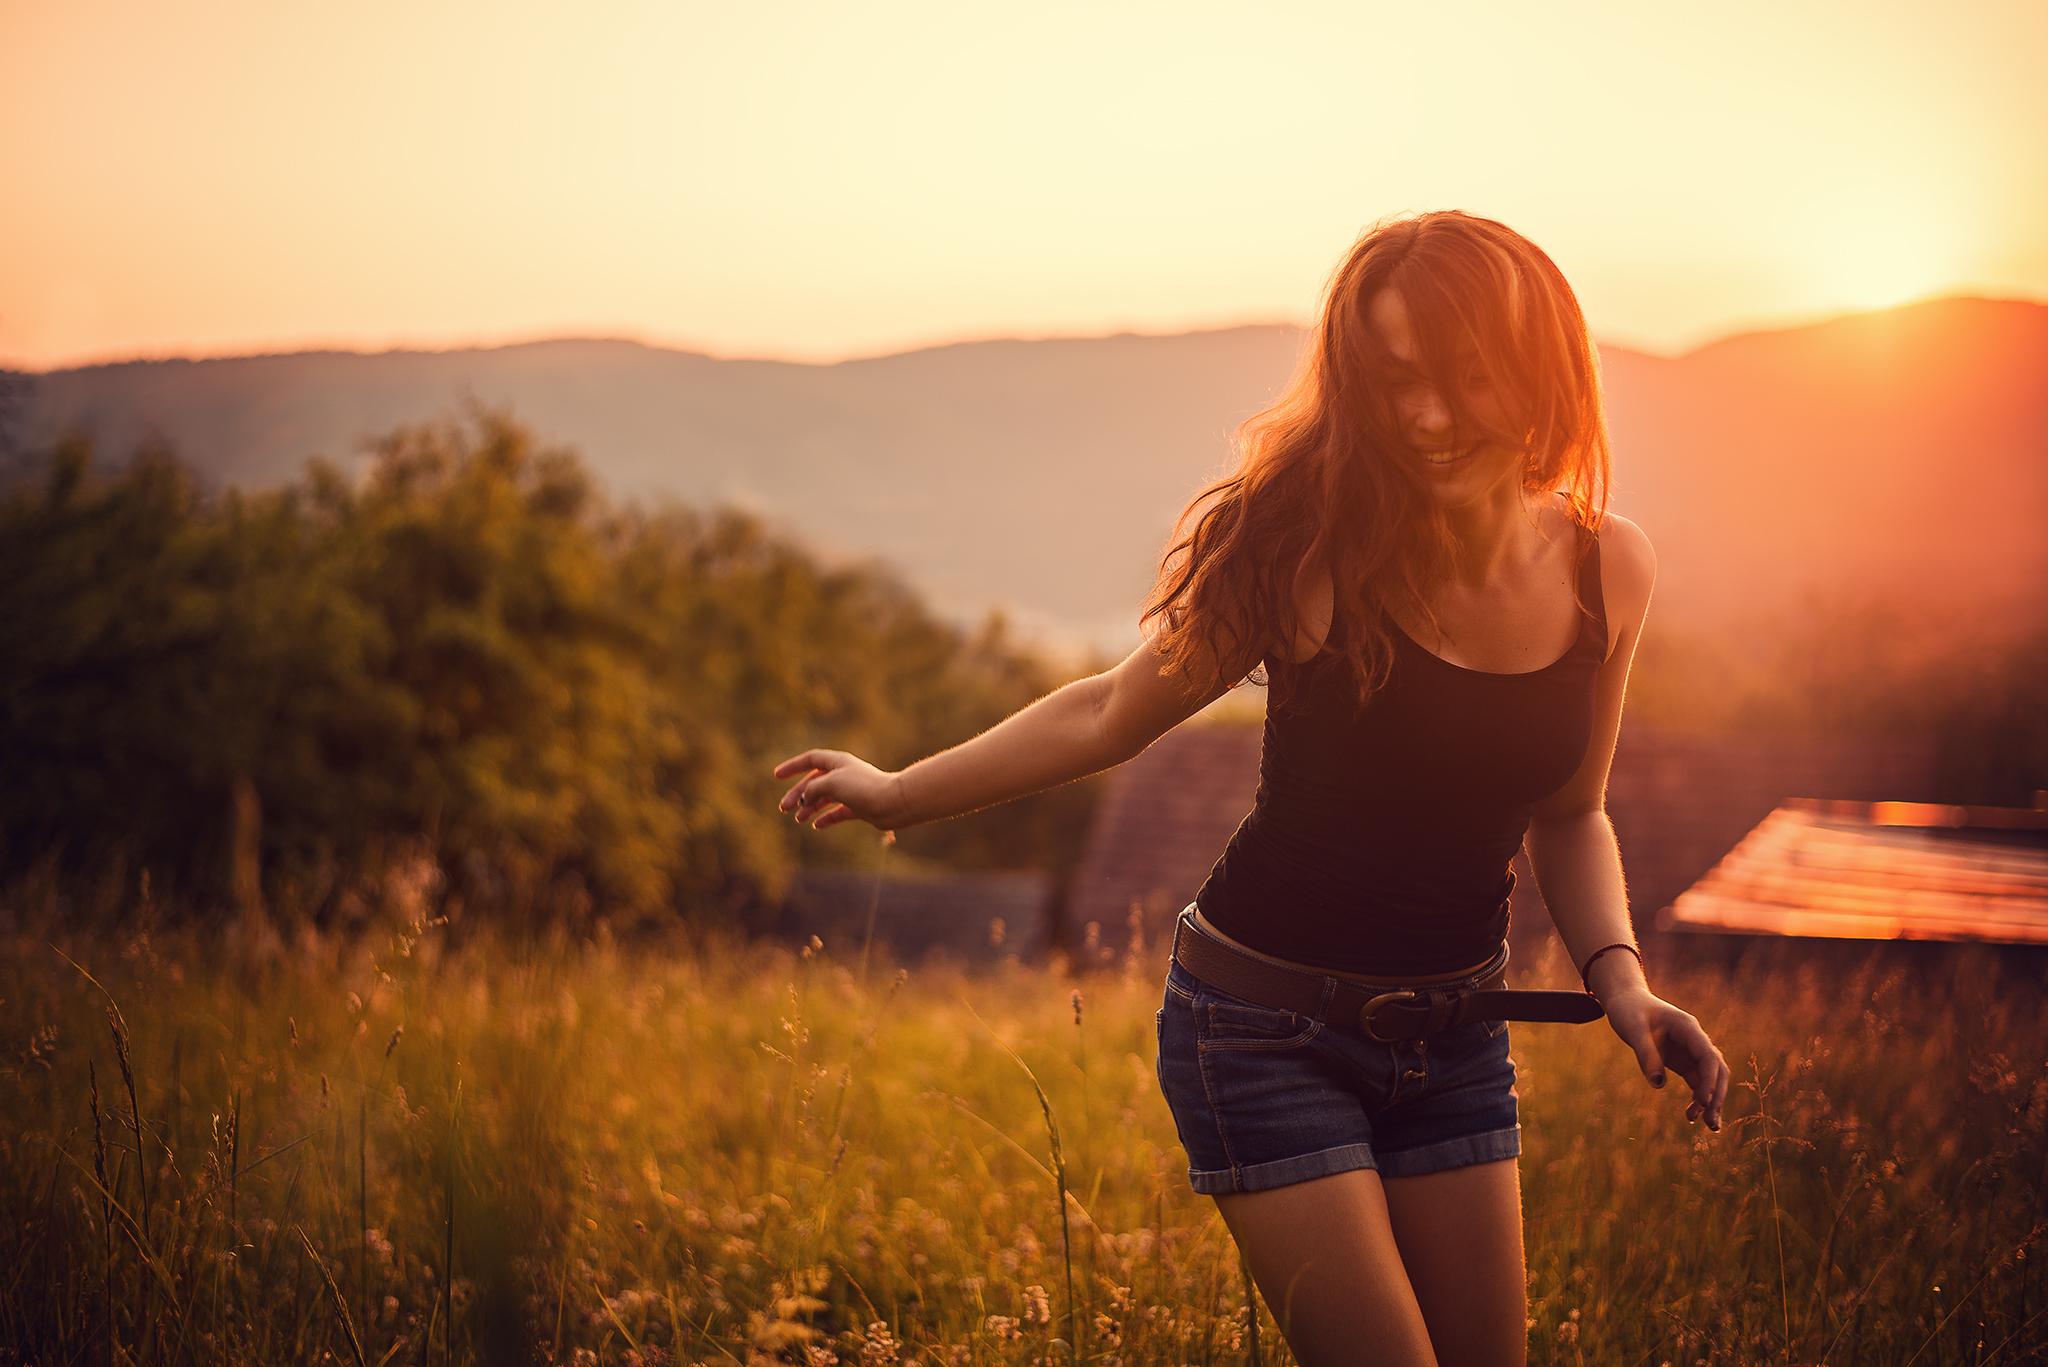 západ slnka, sunset, radosť, happiness, bláznivá, crazy, lúka, moment